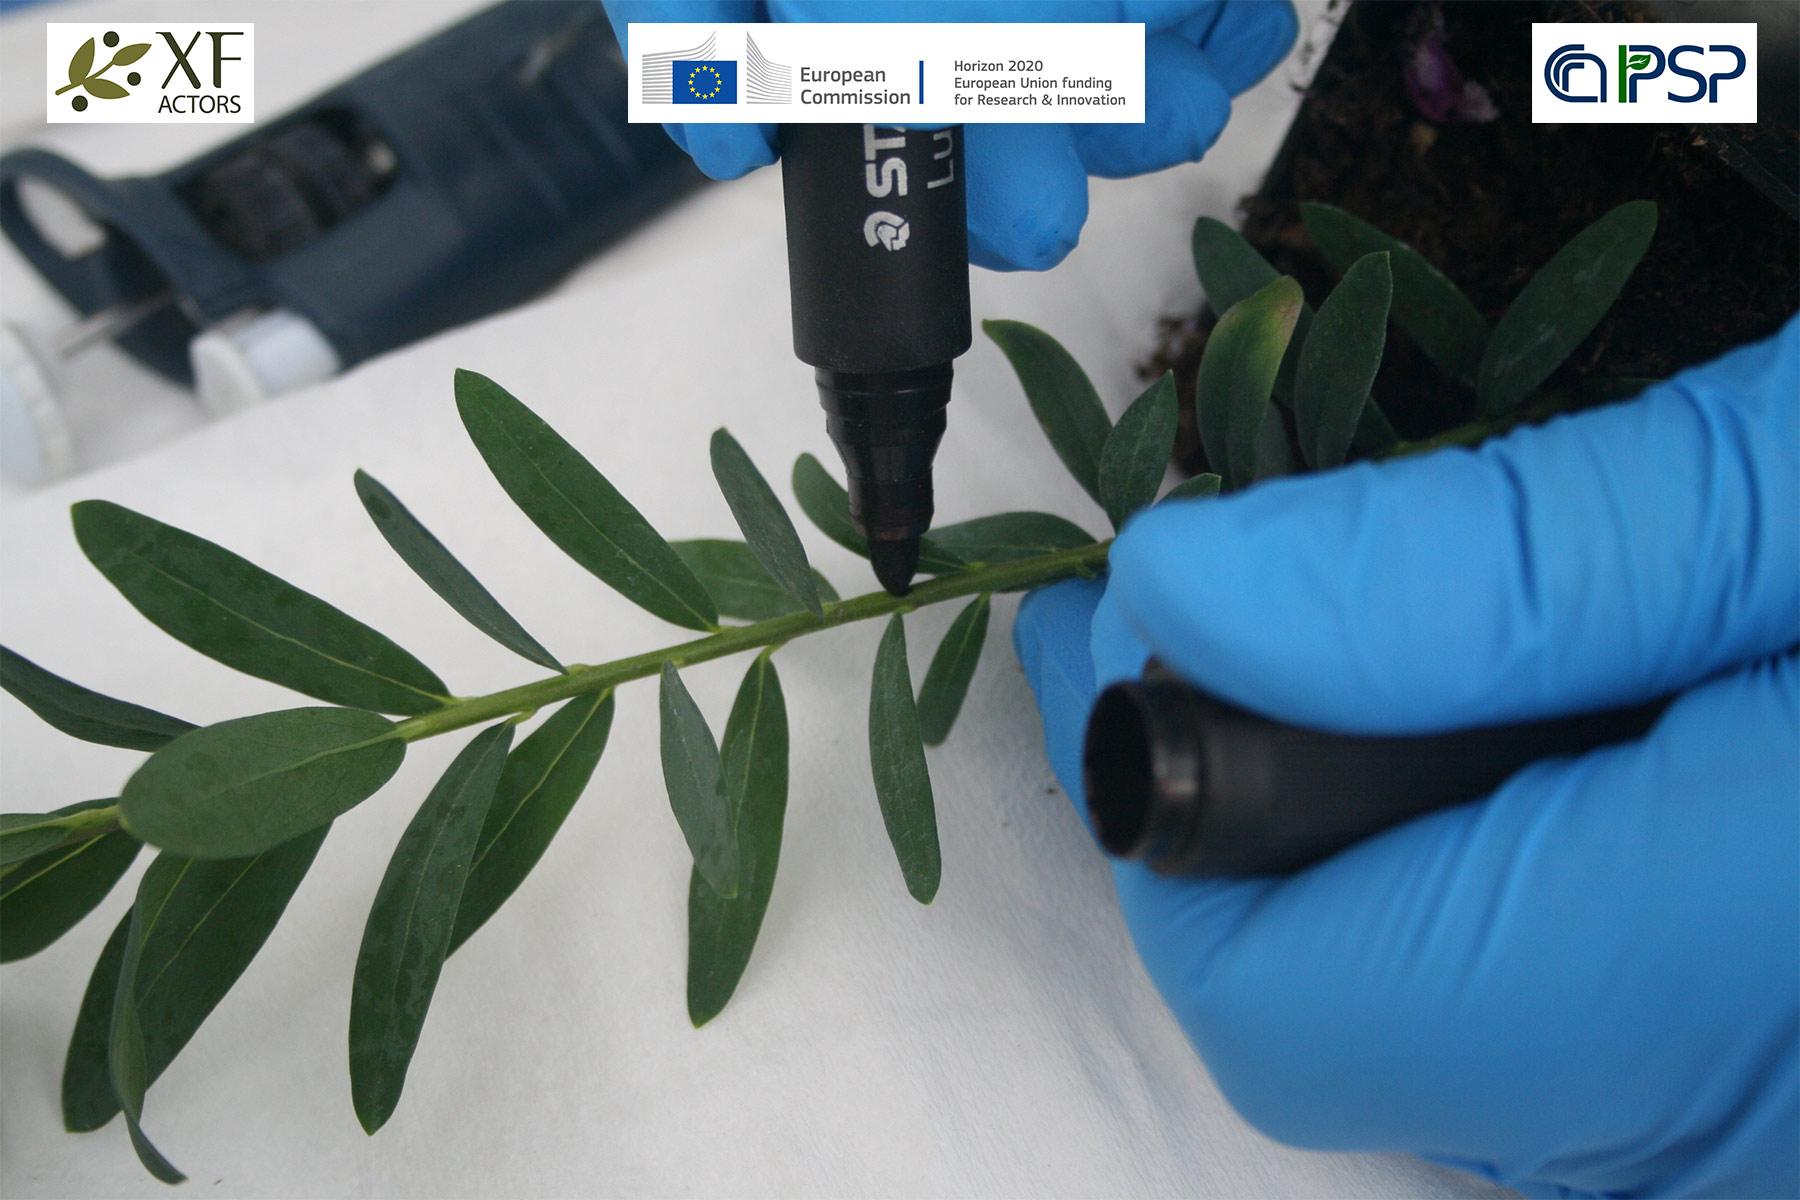 09 - inoculation Xf in Polygala myrtifolia